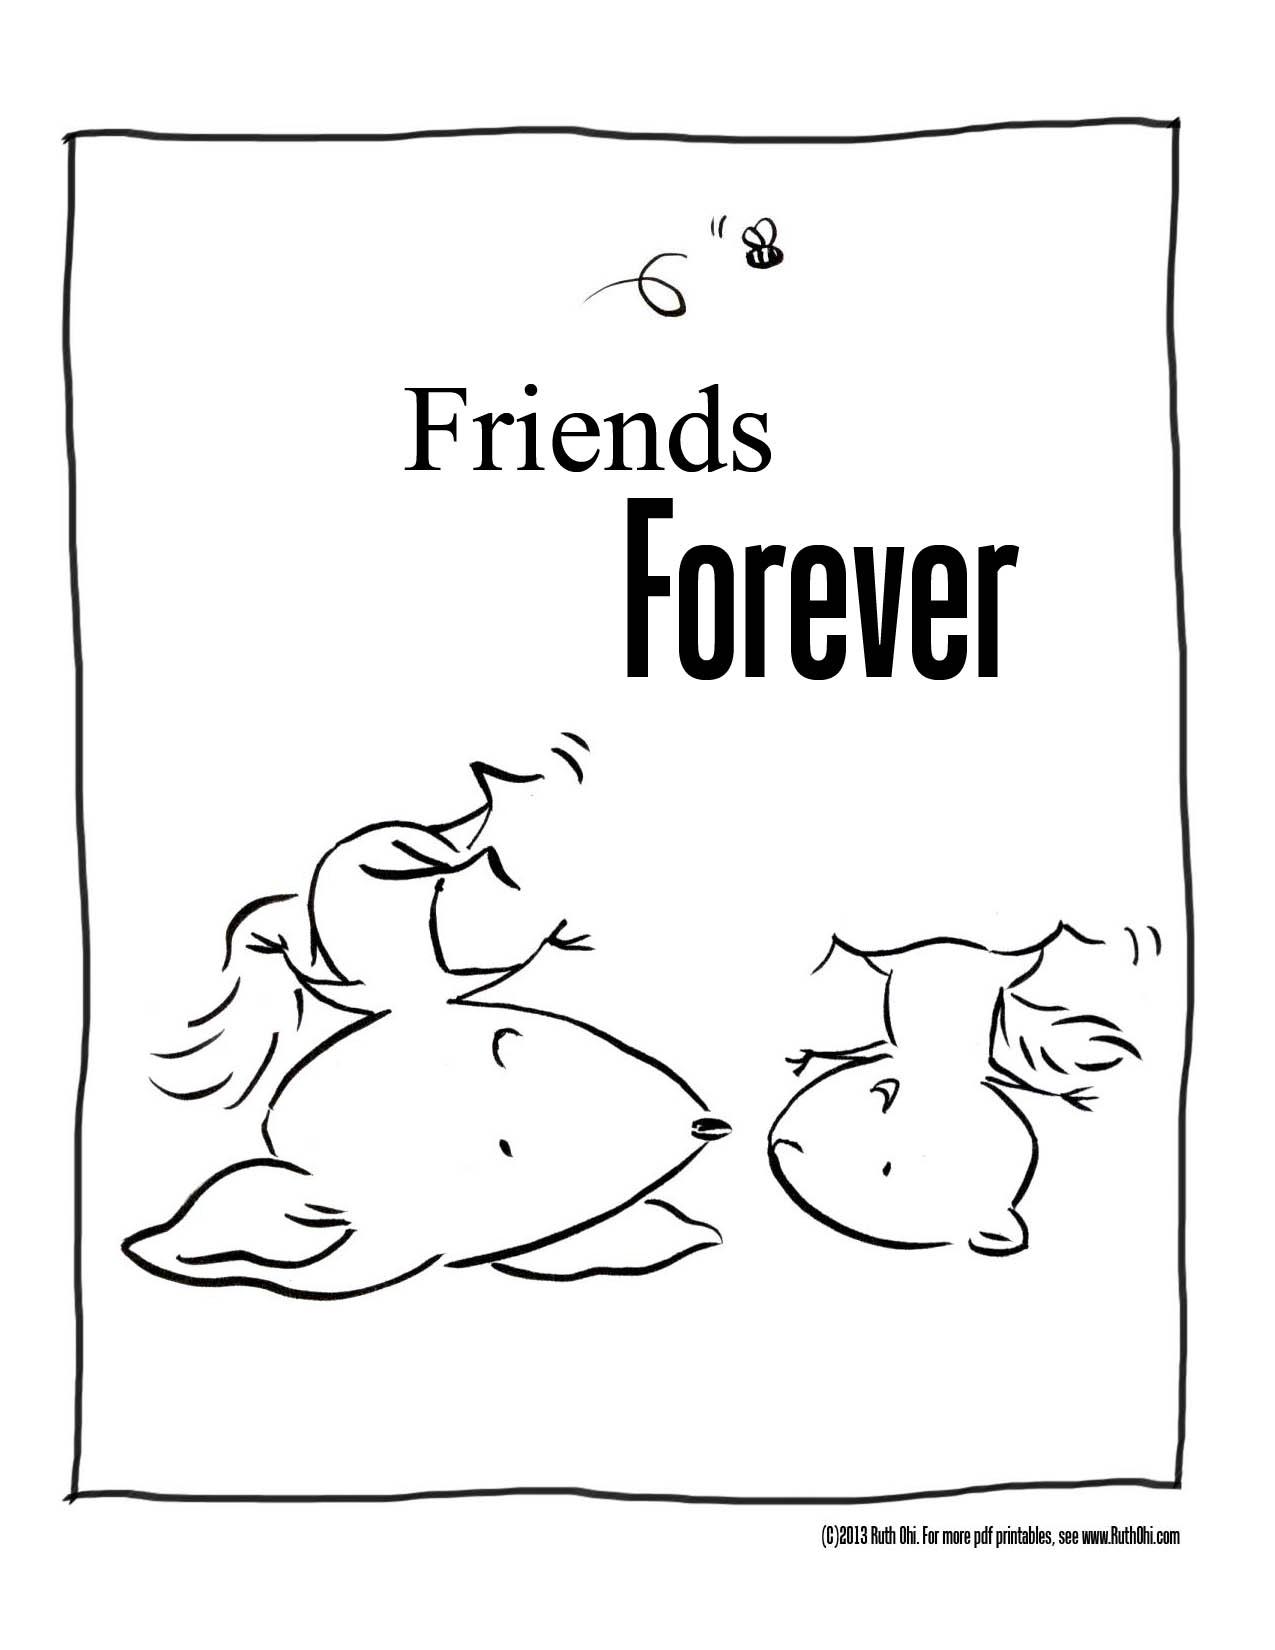 friends forever 1a.jpg